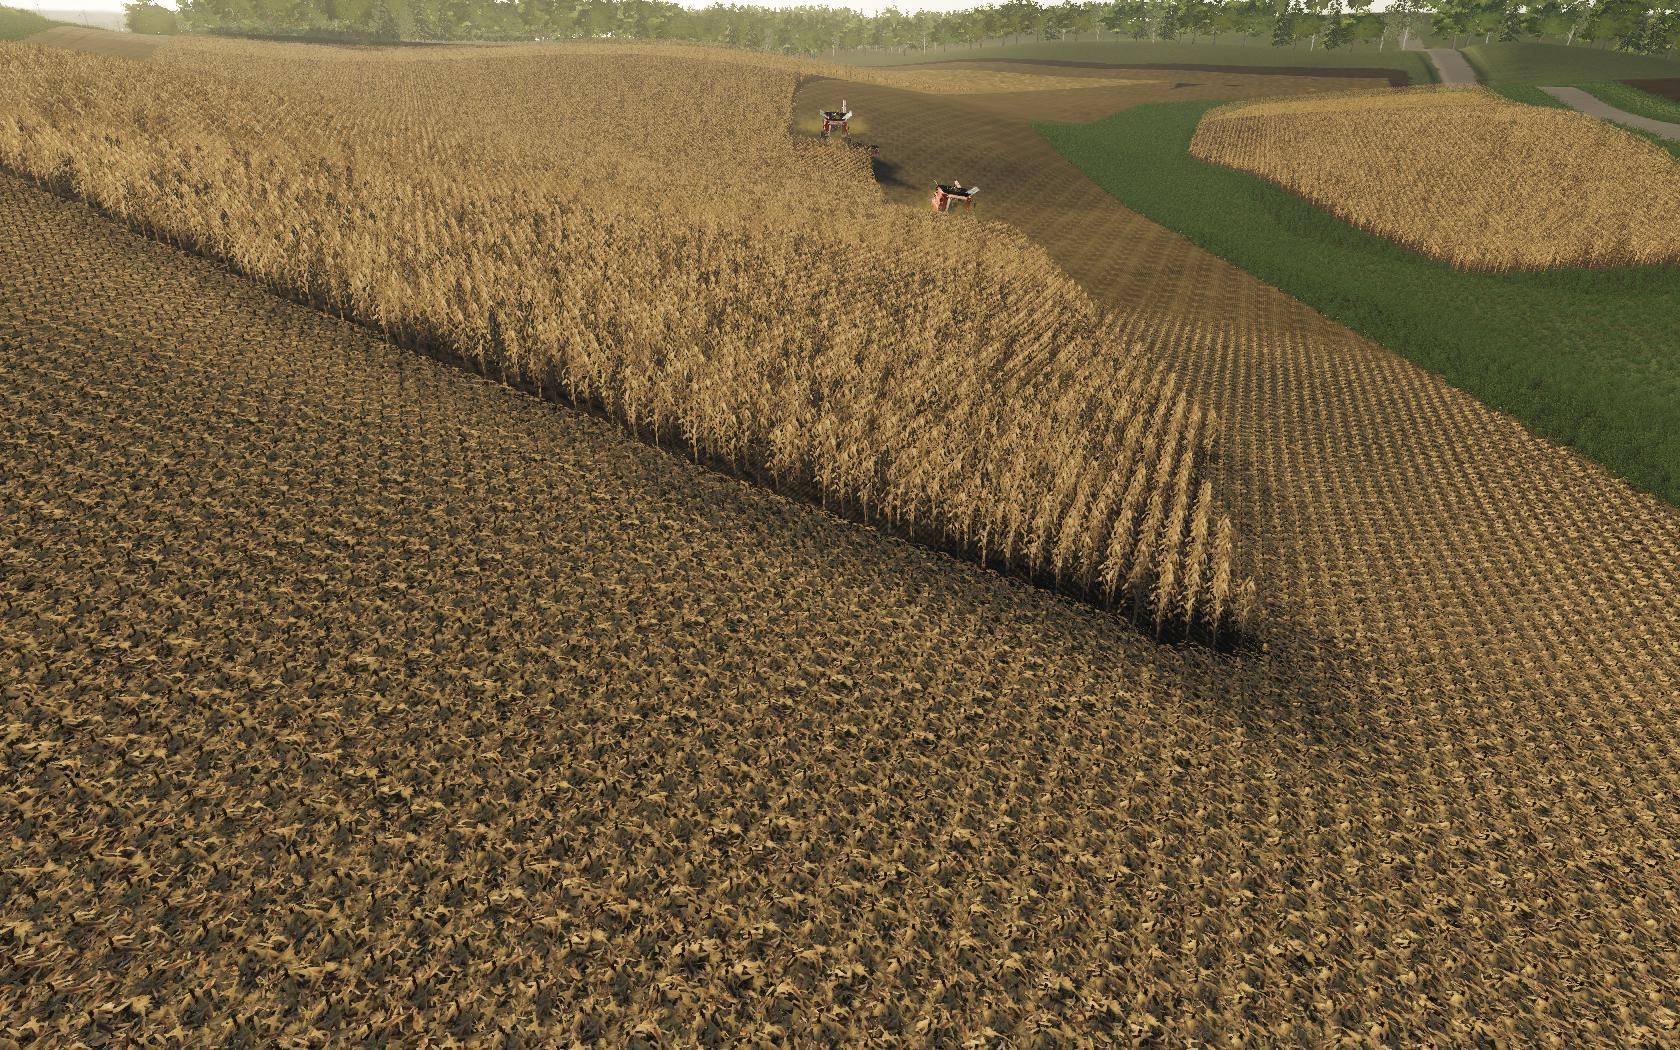 LS 19 Seneca County - Seasons ready v0 8 1 - Farming Simulator 19